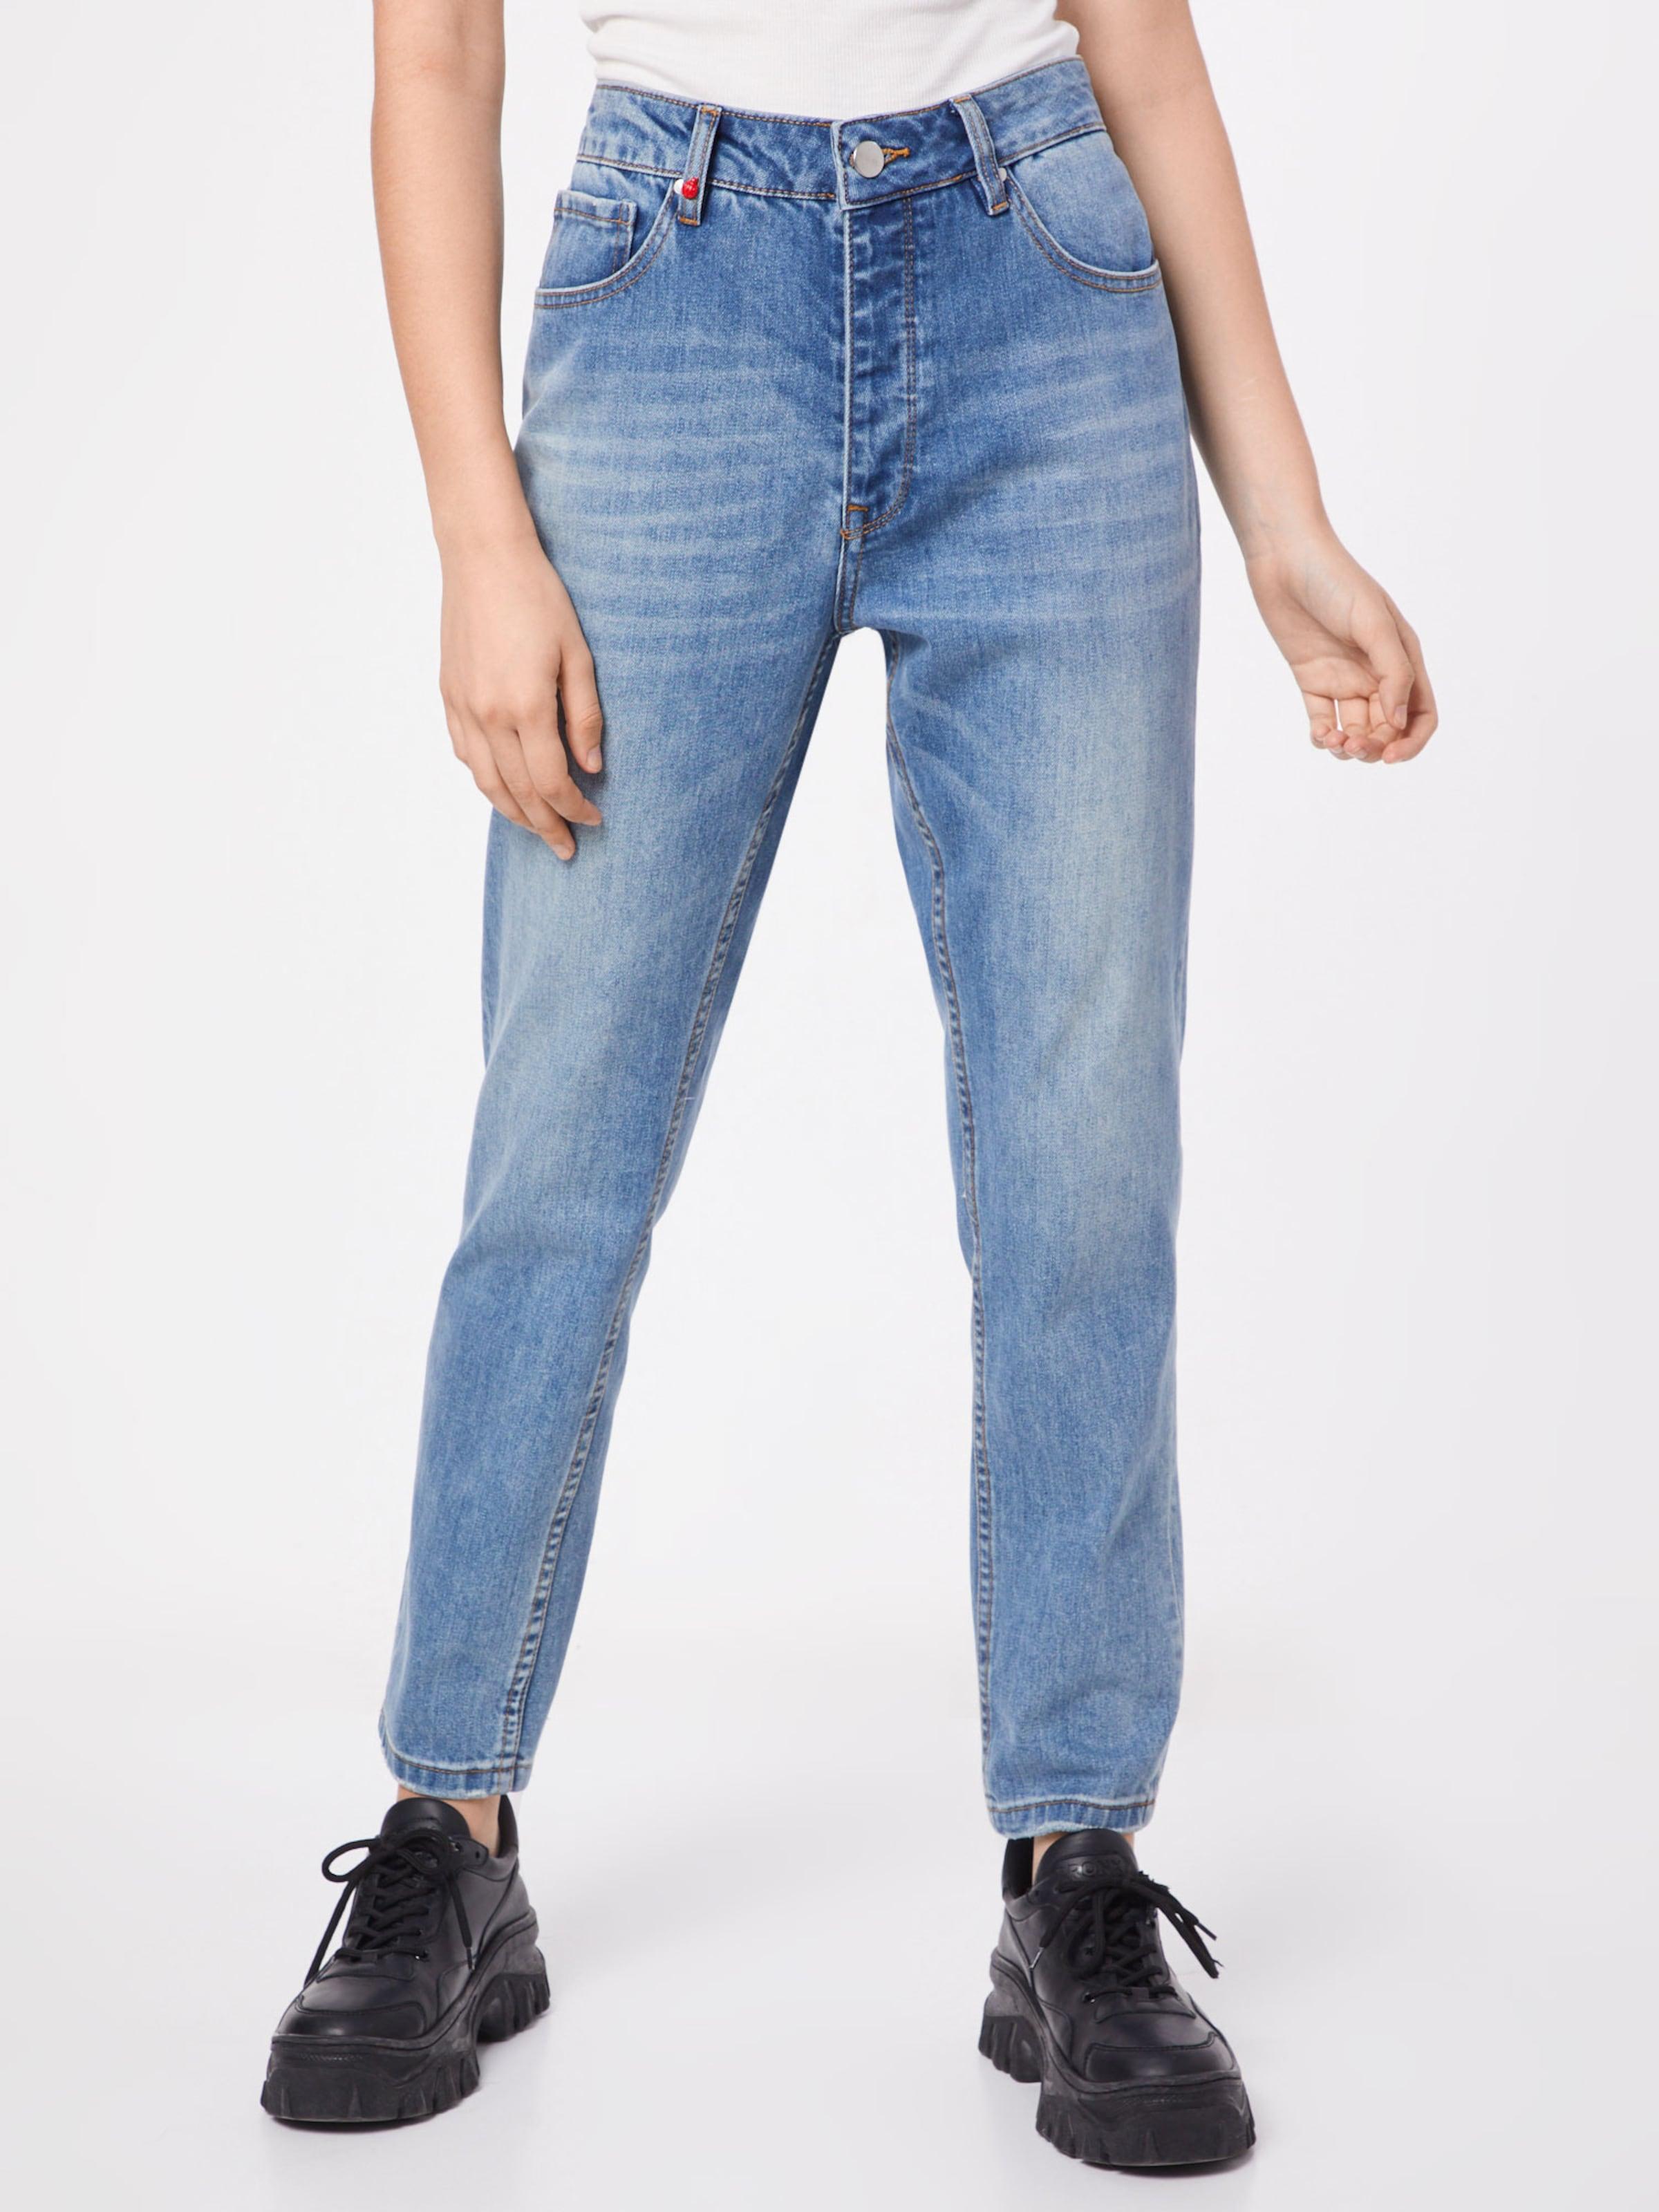 In F mJeans 'pamela' Blau a Ok80Pnw